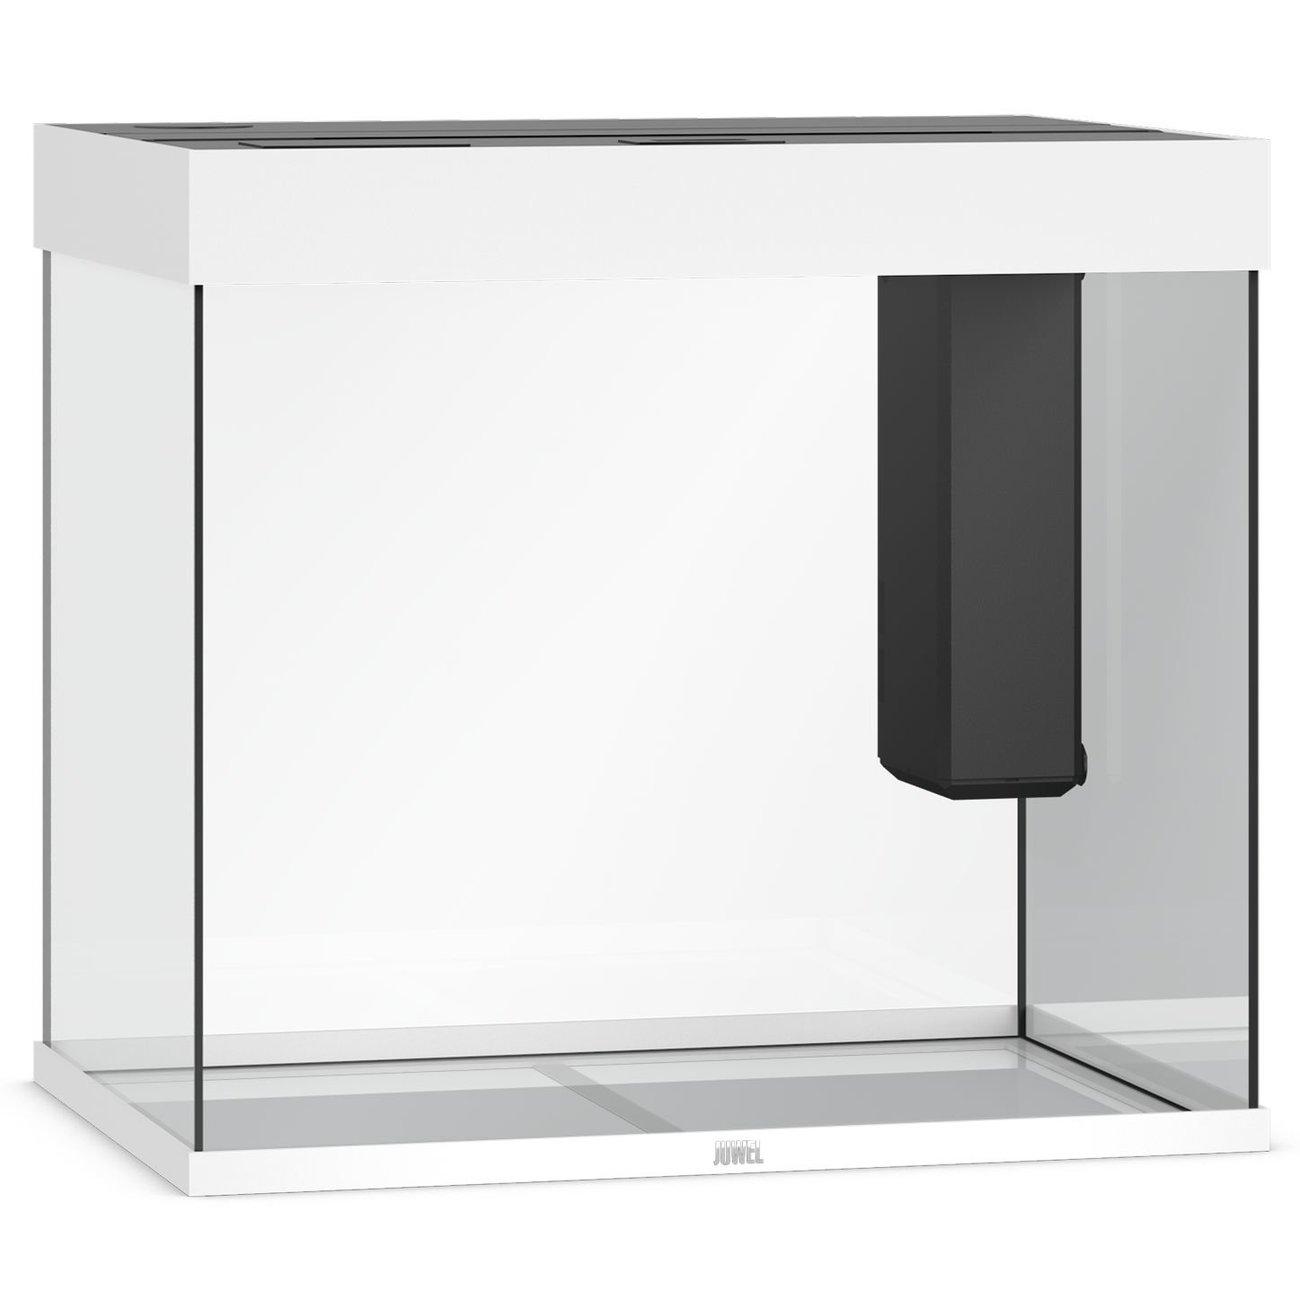 Juwel Lido 200 LED Aquarium, Bild 12